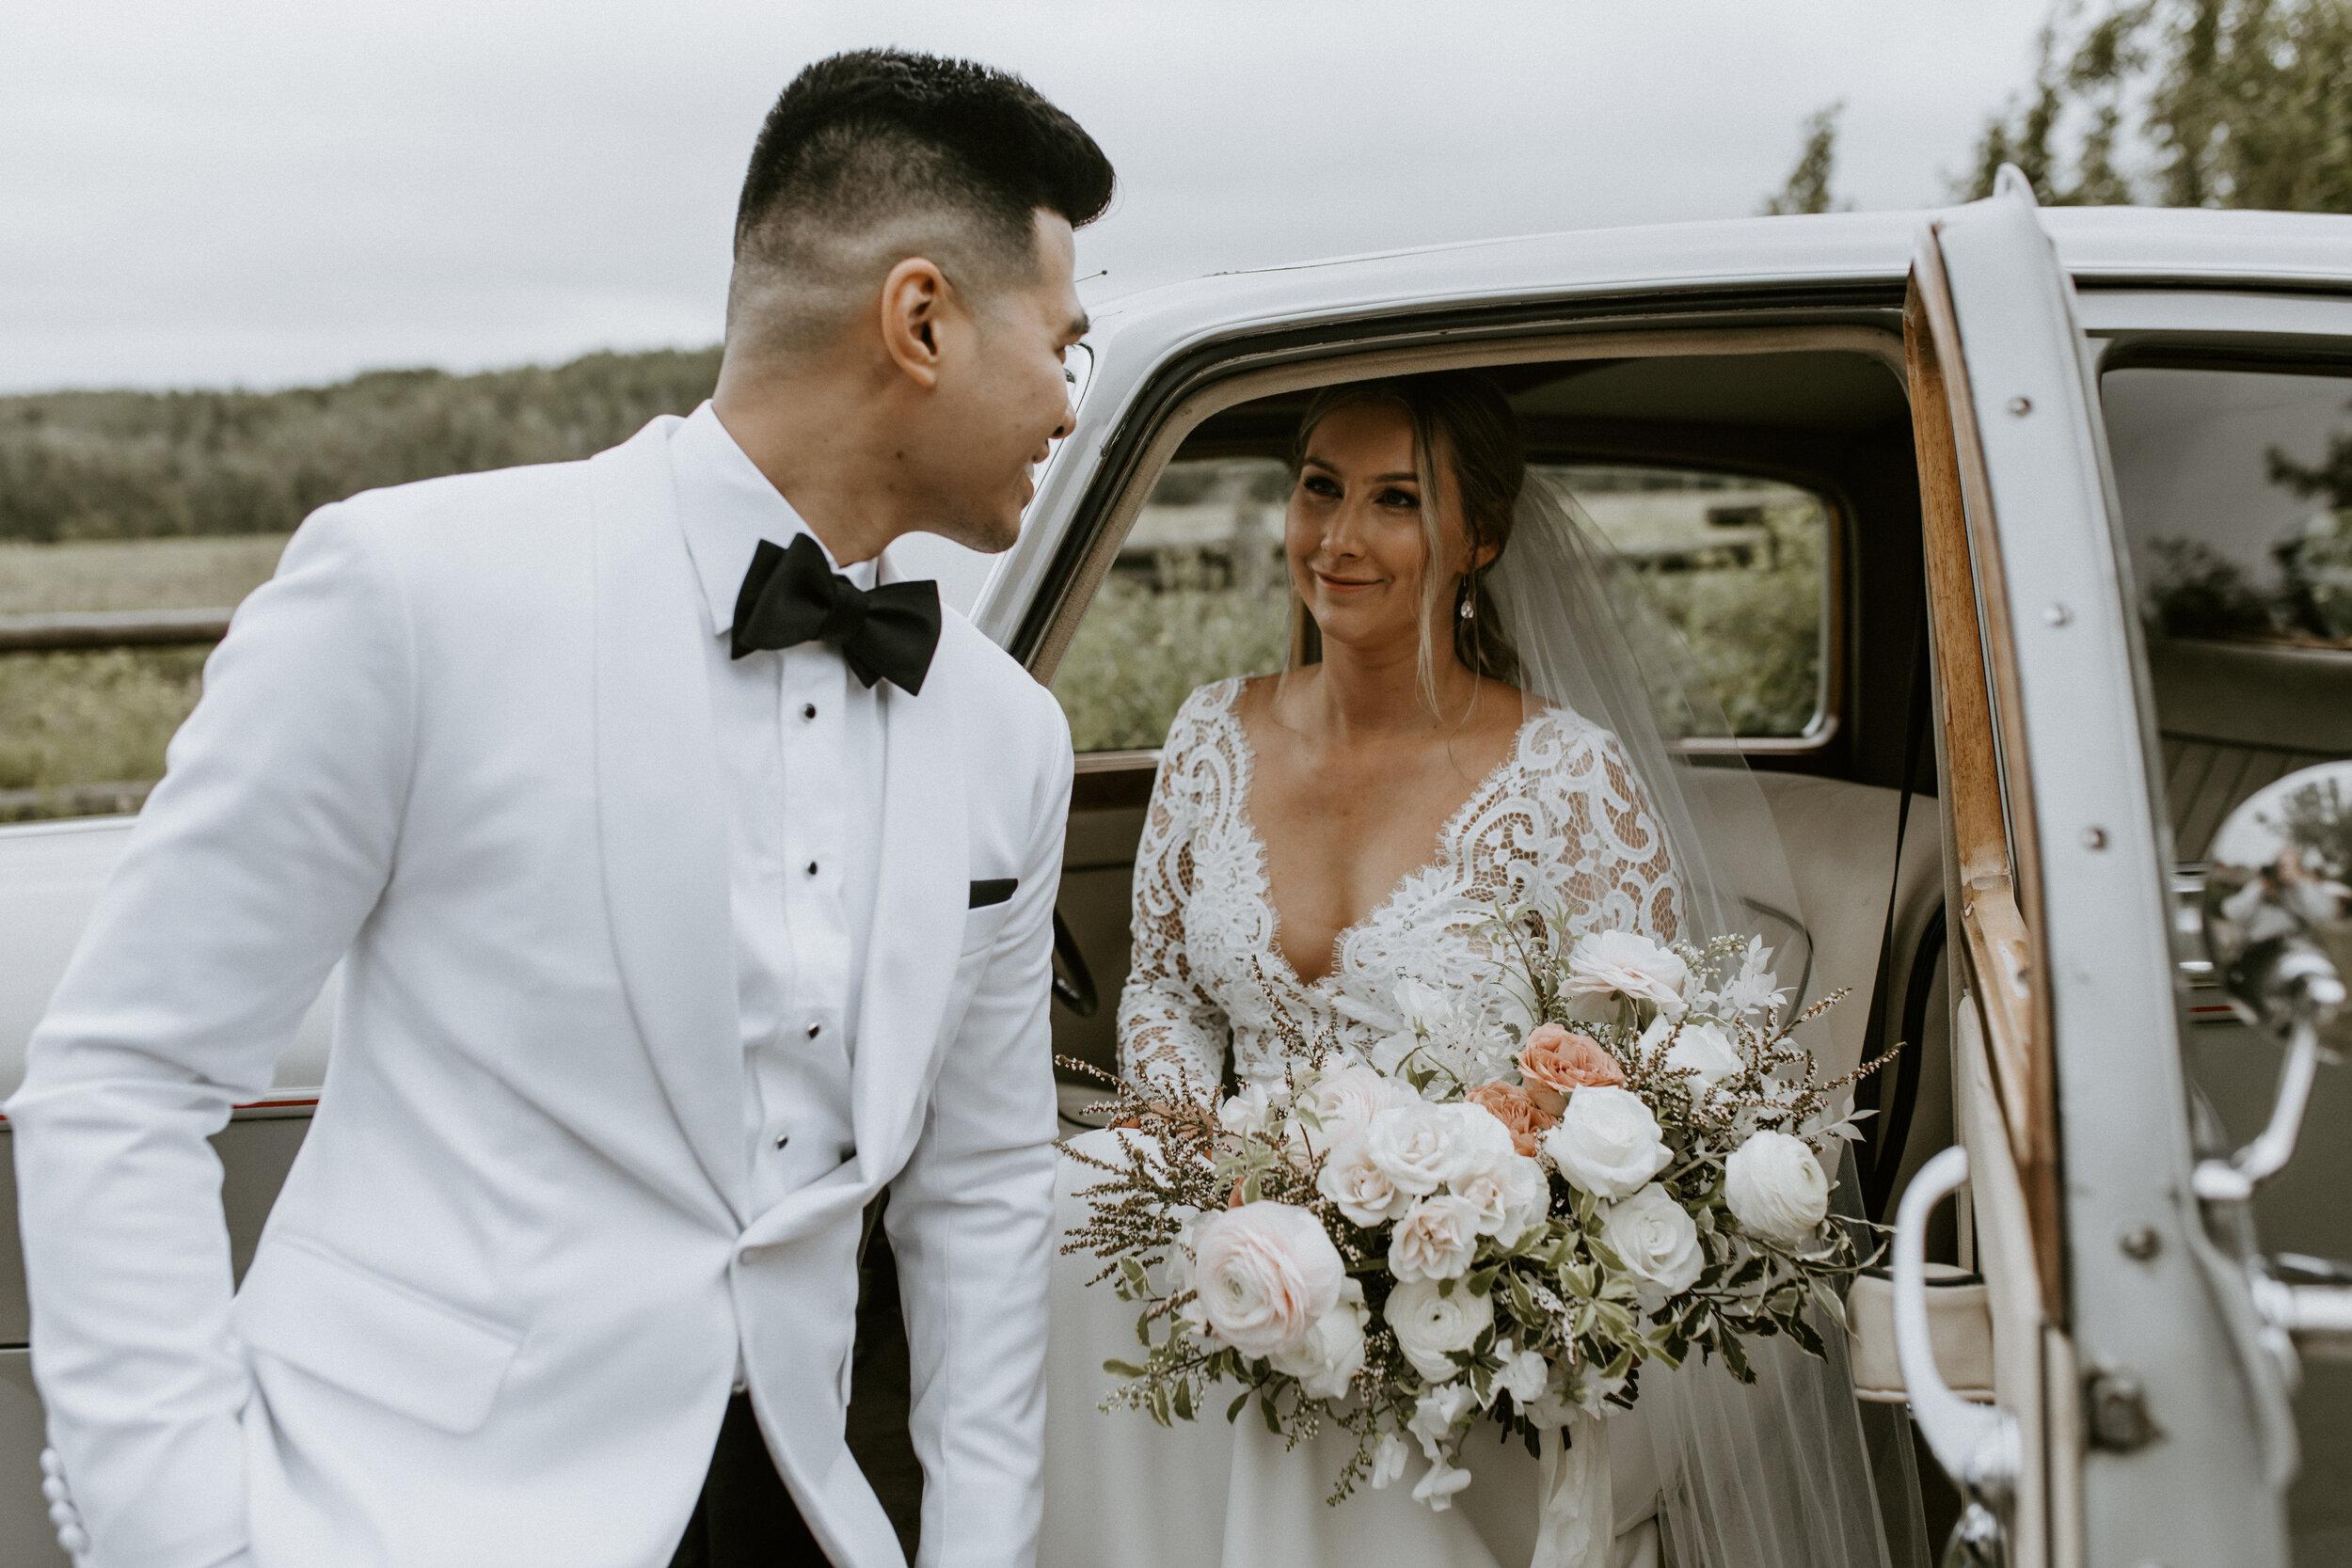 Bride and Groom - Wedding Style Inspiration - Just Married - Vintage Rental Car